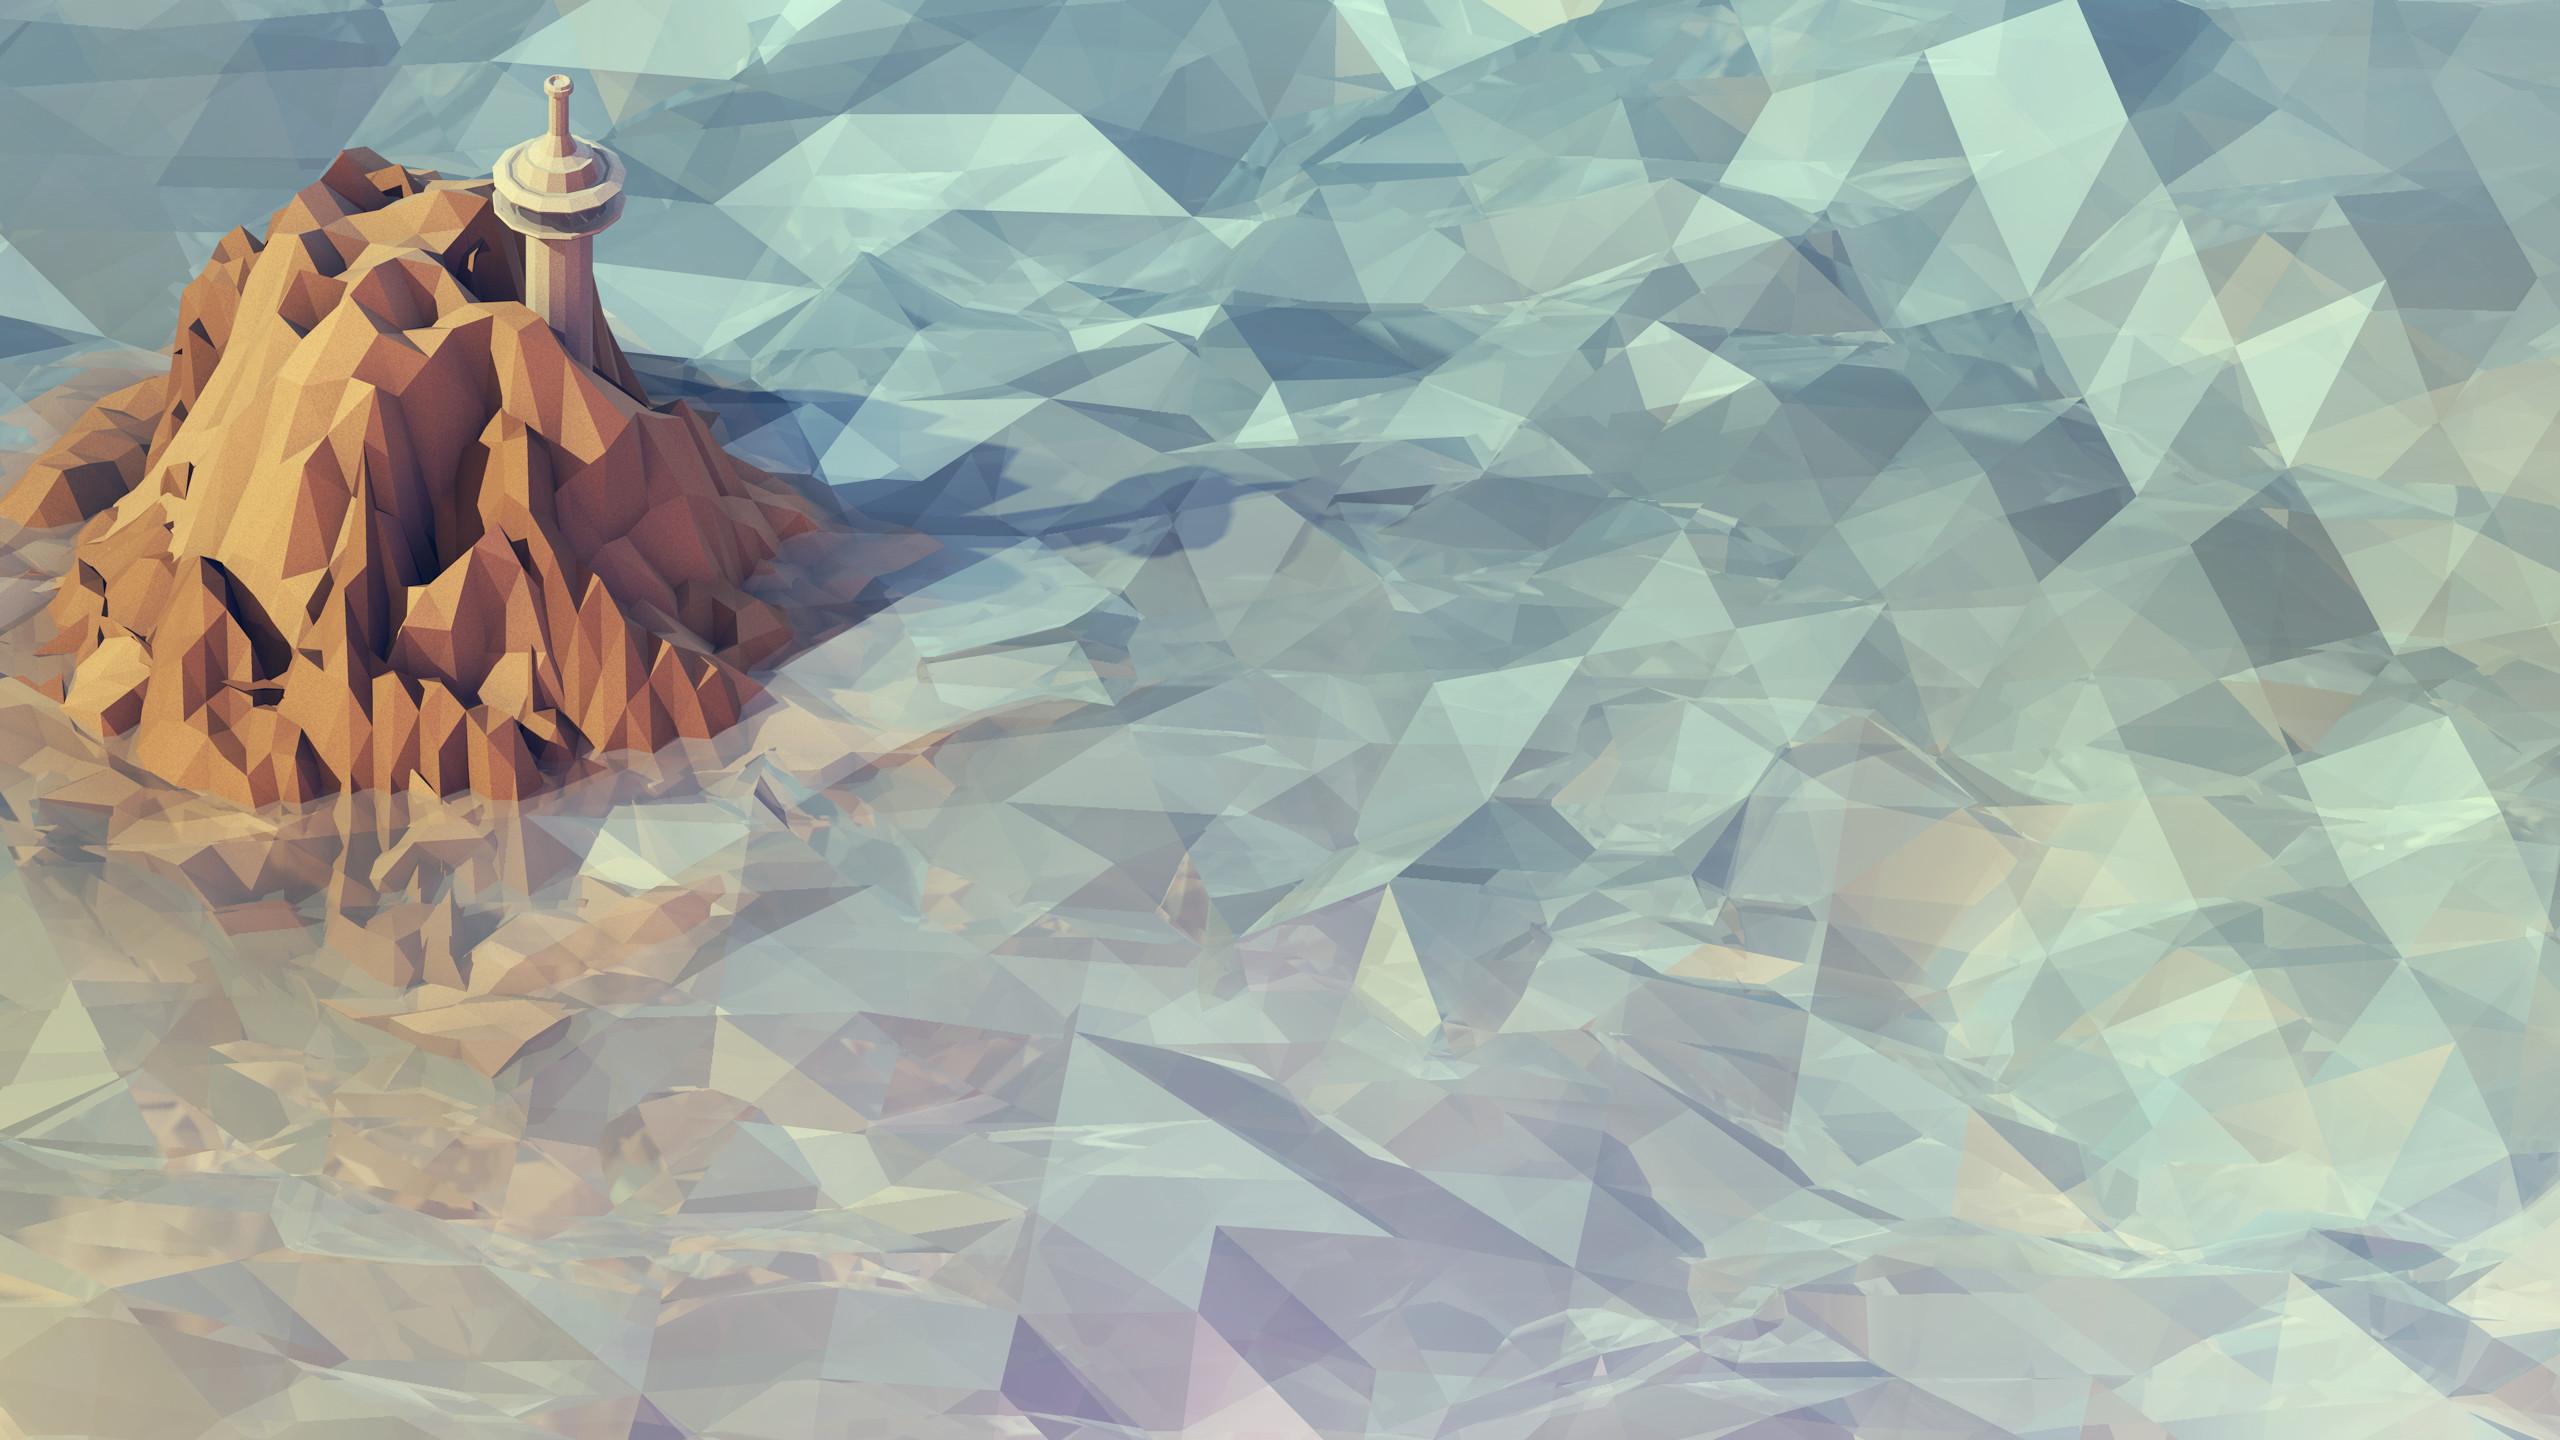 Res: 2560x1440, Polygon Wallpaper 22